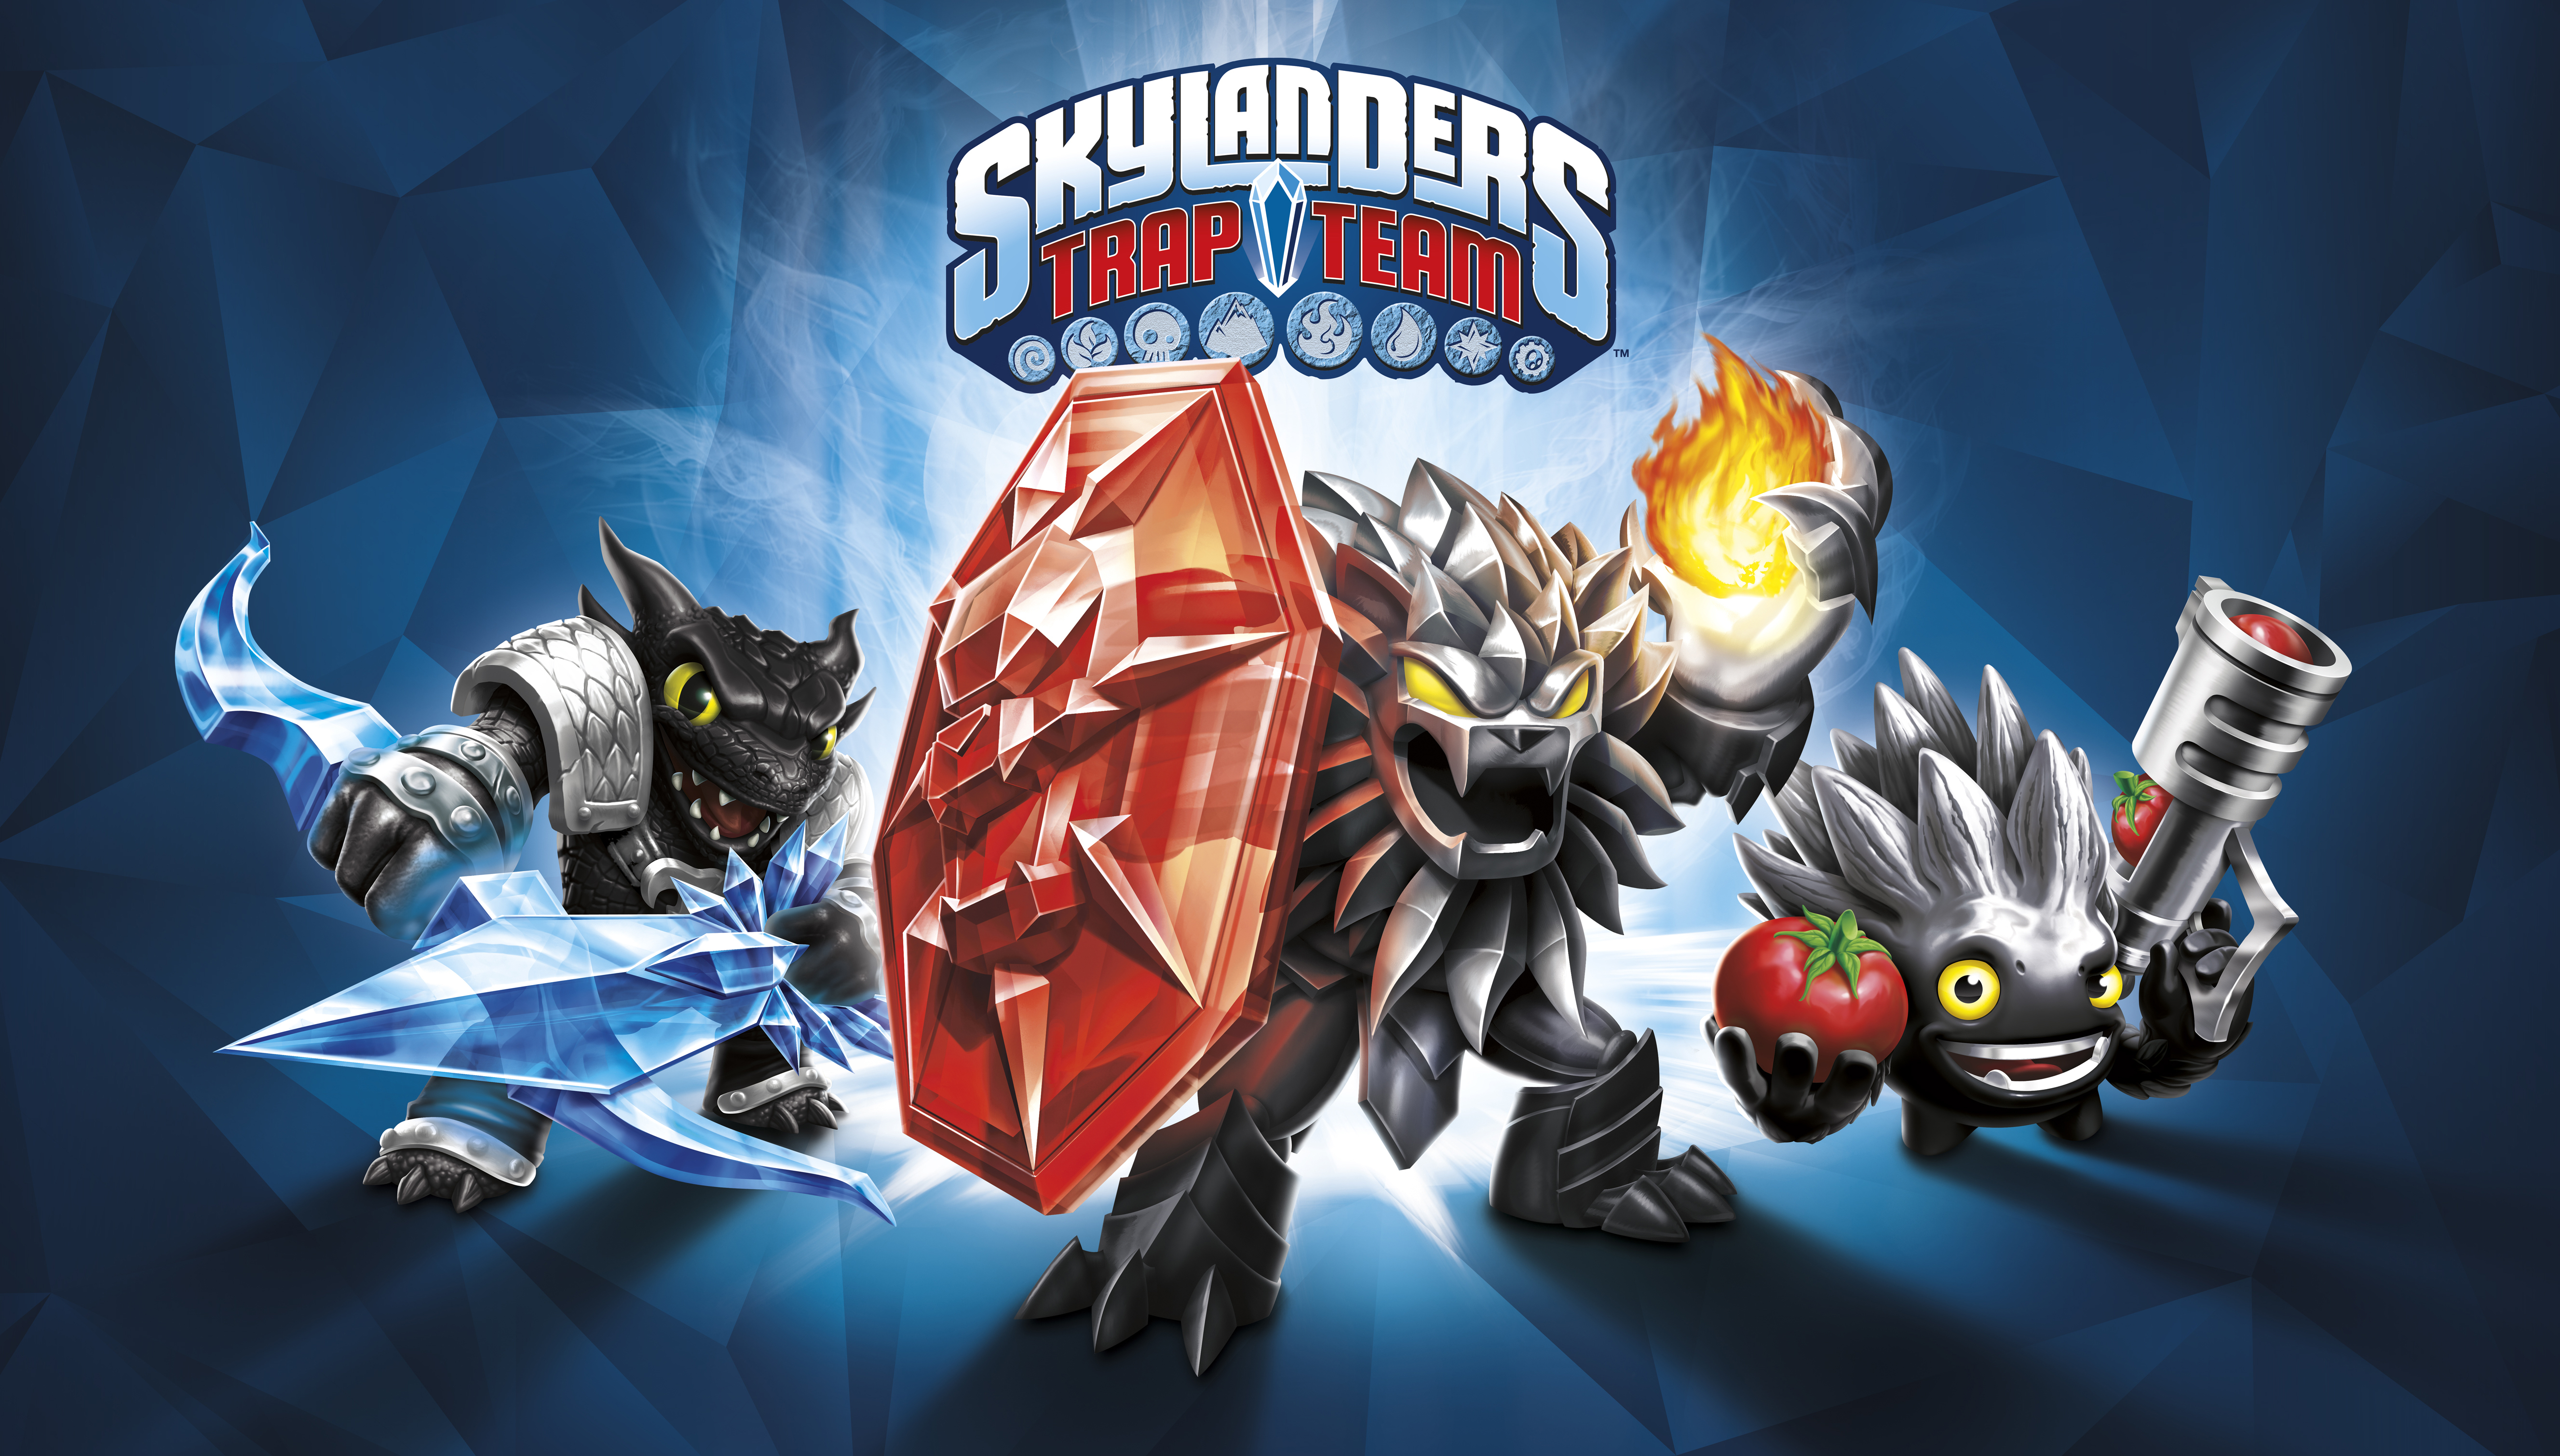 Skylanders Trap Team Dark Edition Key Art. (Photo: Business Wire)